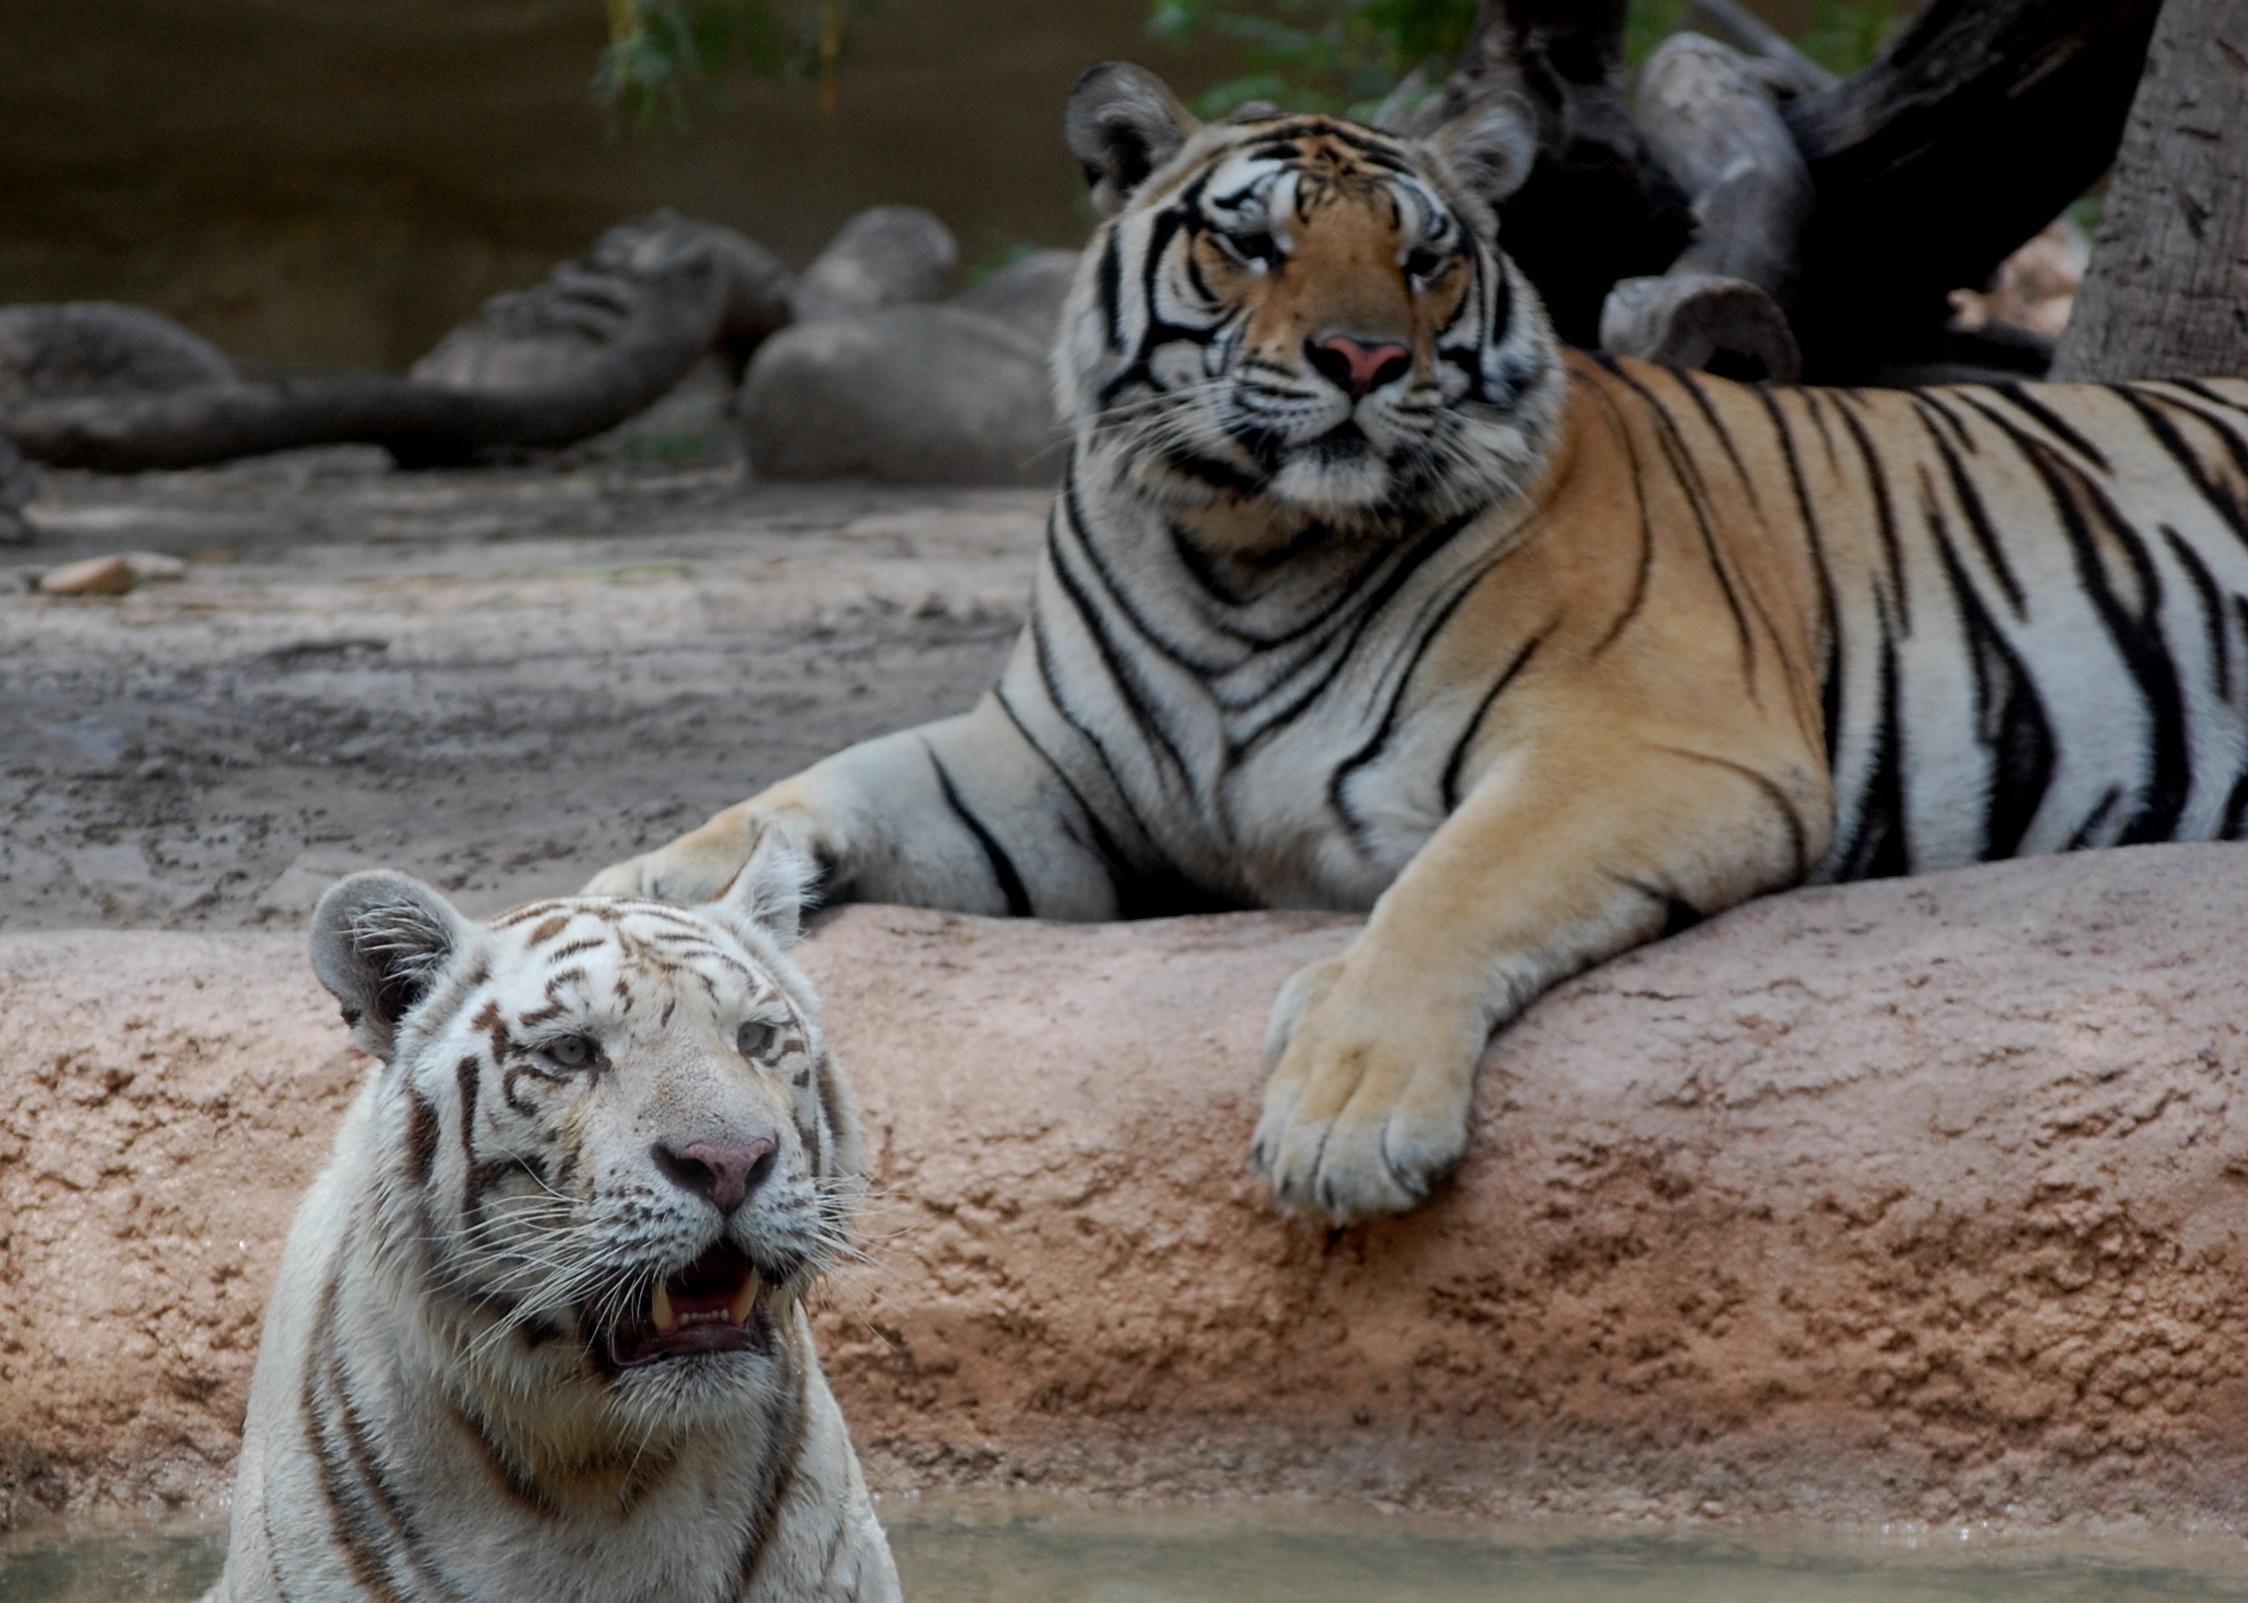 whitetigerandfriend.jpg - White Tiger and Friend